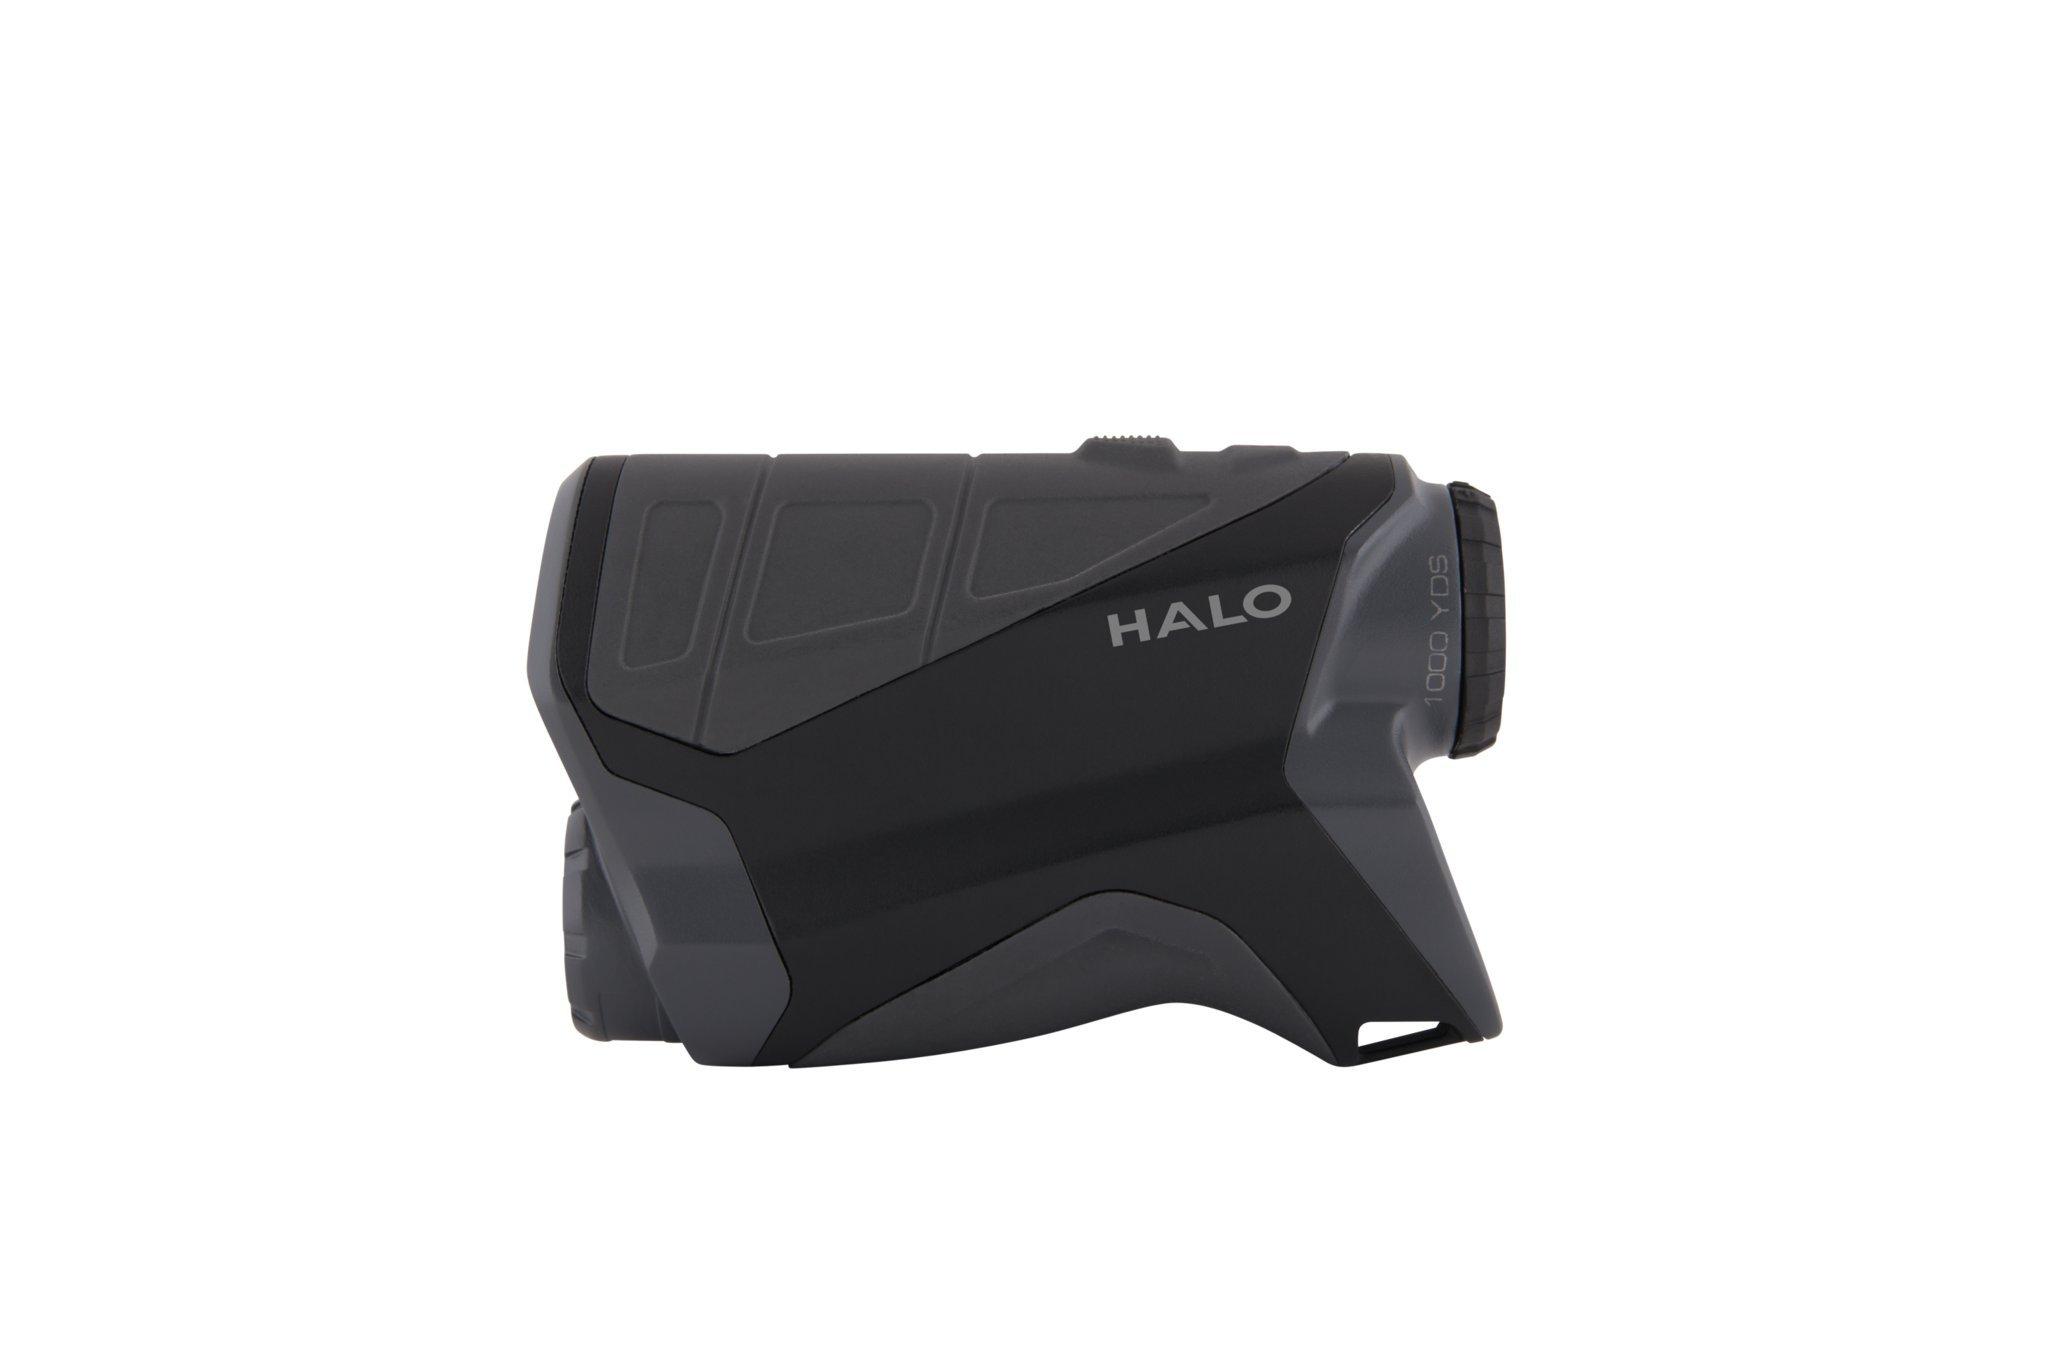 Halo Z1000-8 1000 Yard Laser Range Finder